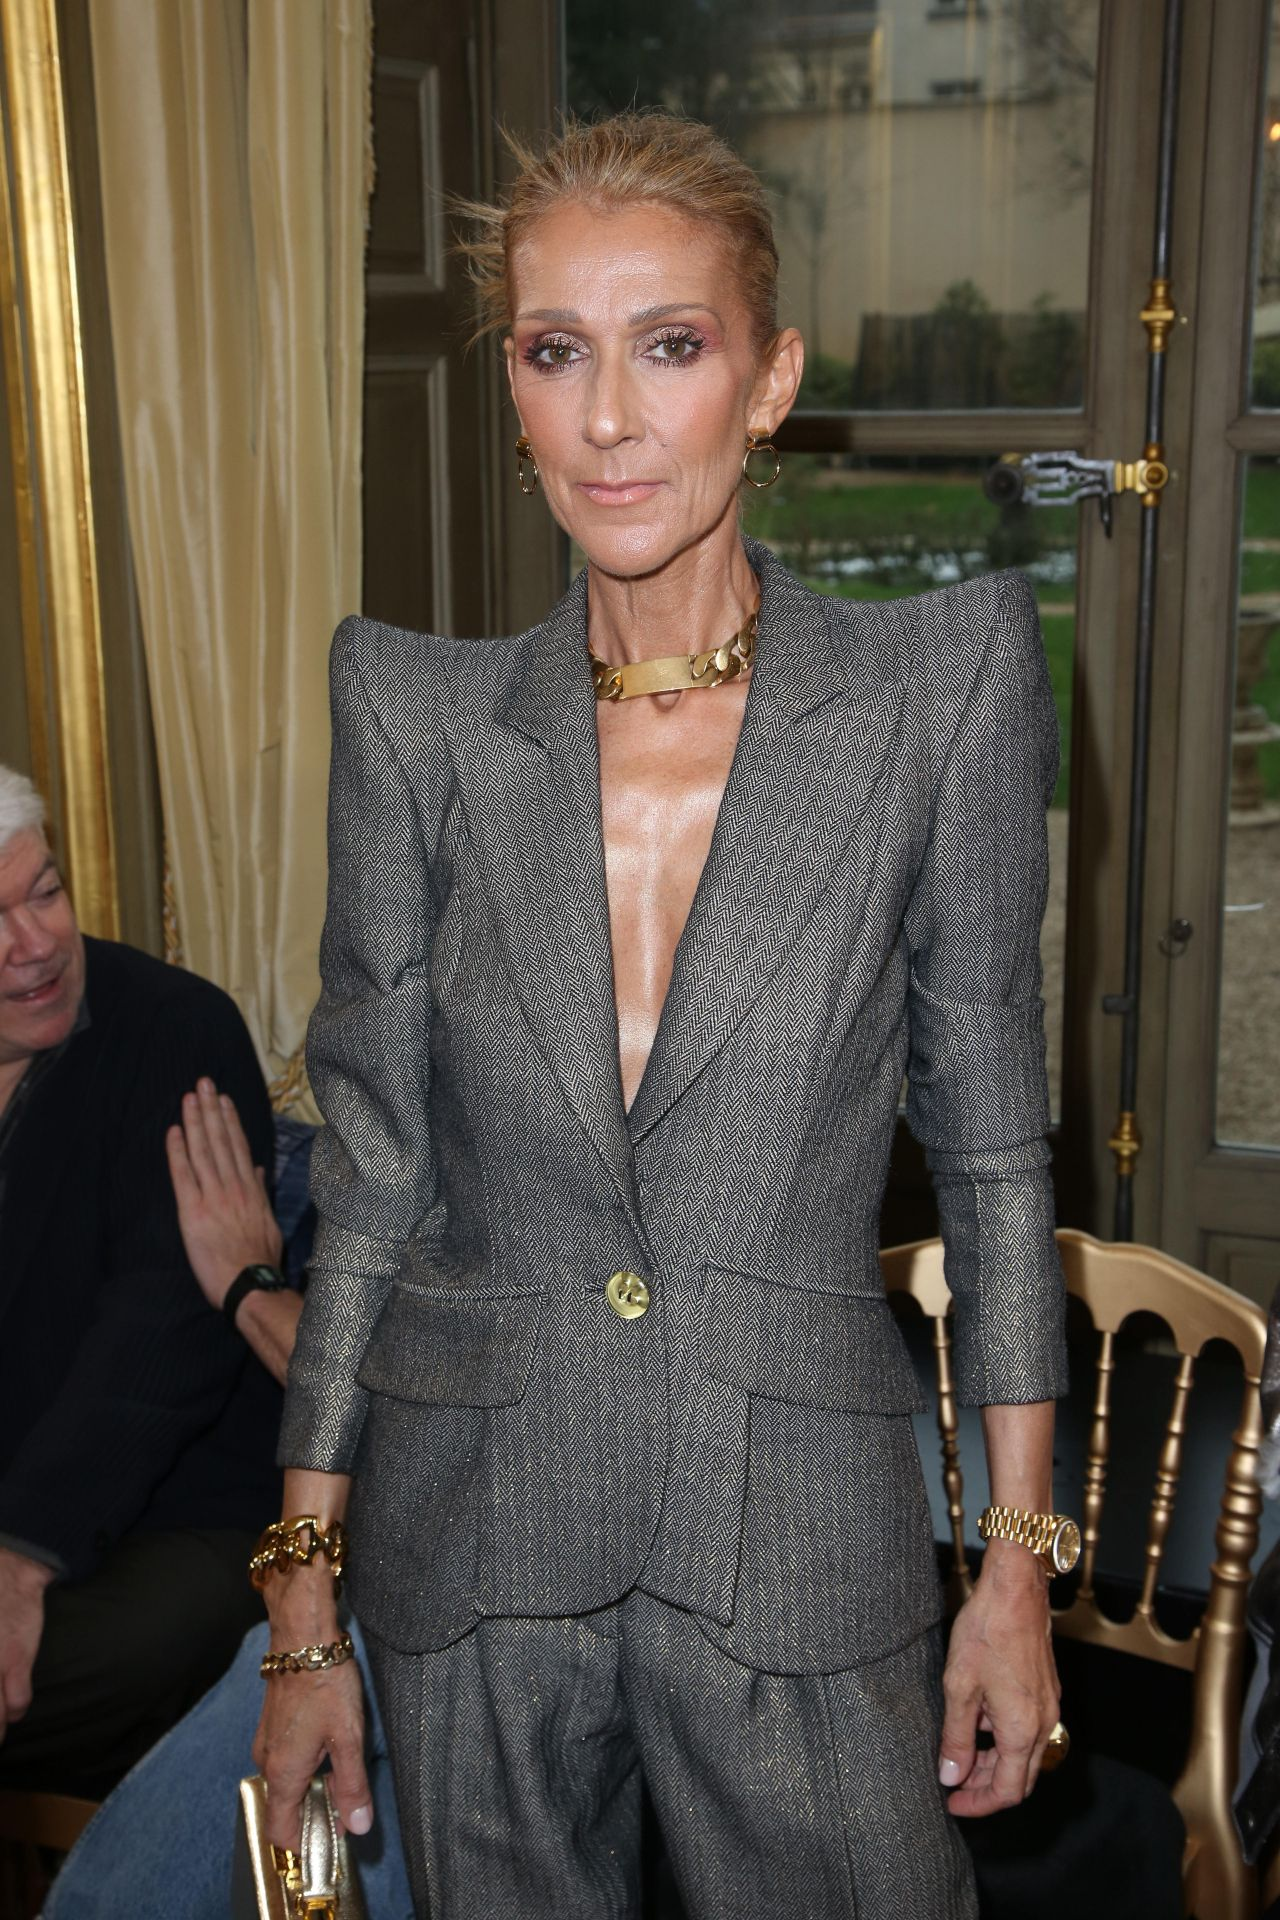 Celine Dion Ronald Van Der Kemp Show In Paris 01232019